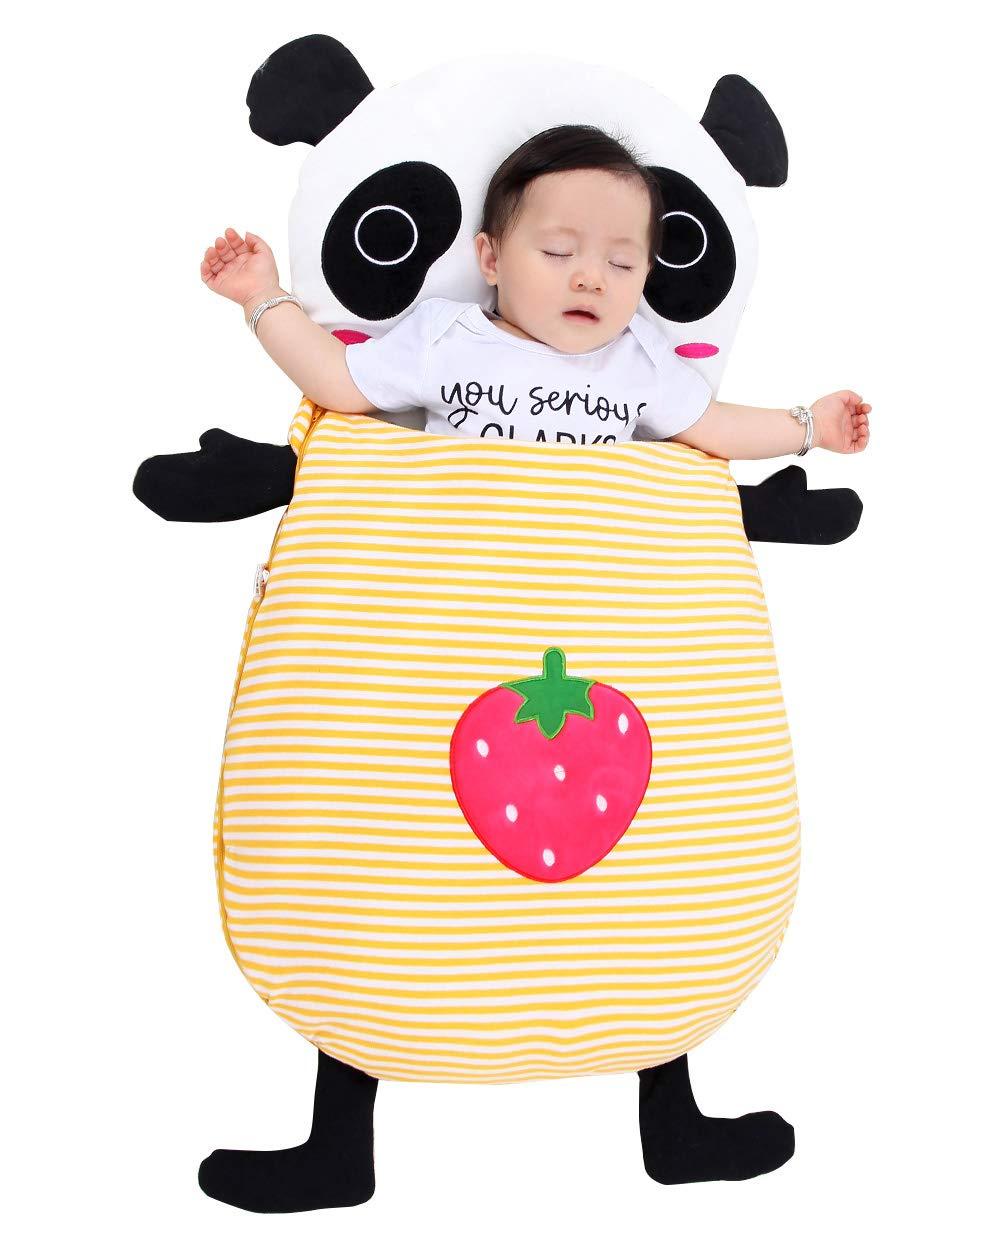 Toddler Baby 3 in 1 Blanket Snap Mat Cute Crab Sleeping Bag Nursery Swaddle Wrap for 0-12 Months YANYINGBEIER